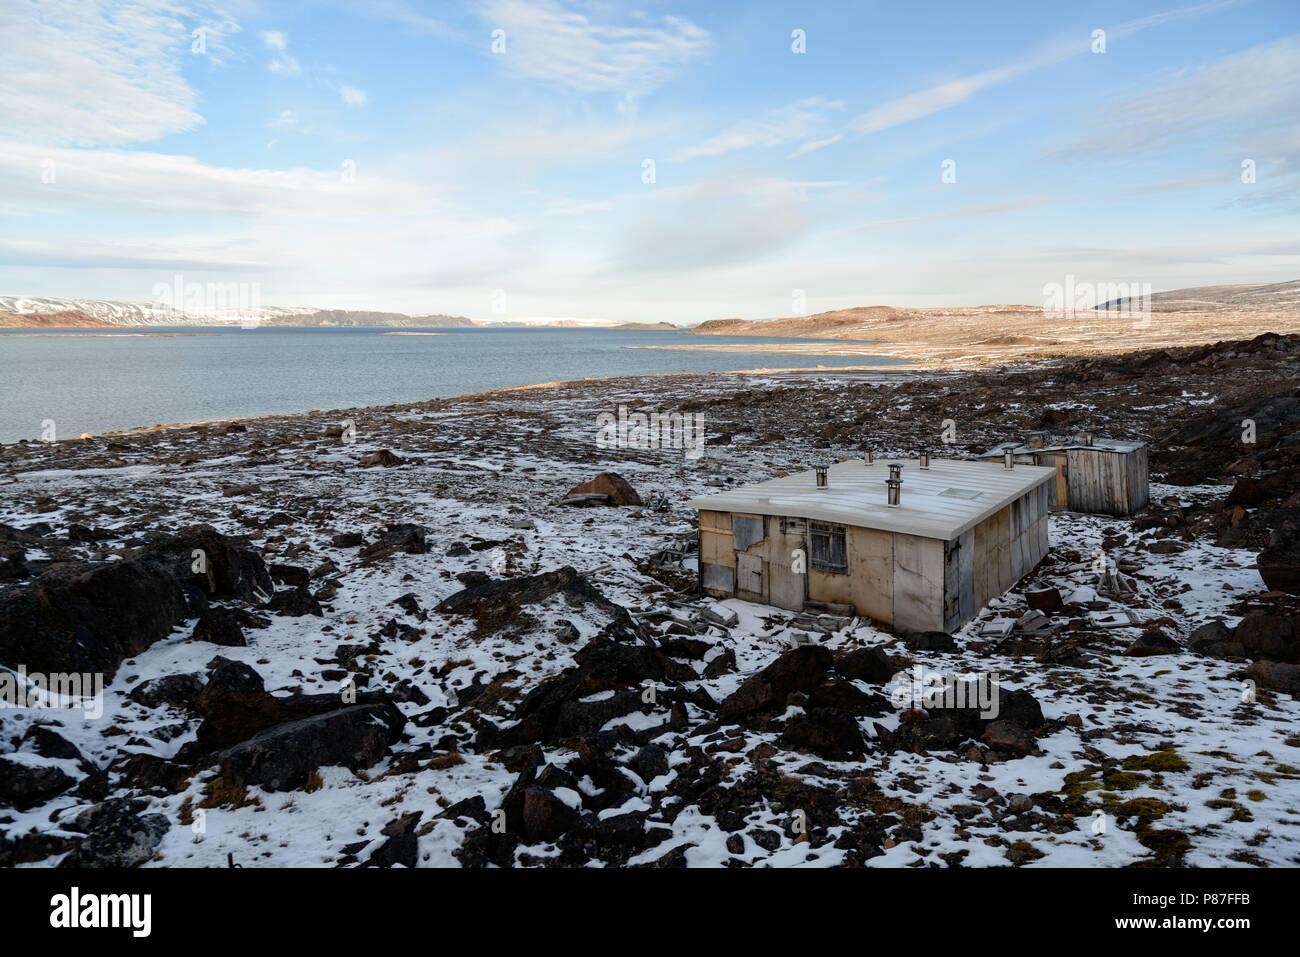 Rijpfjorden, Nordaustlandet, Svalbard. German meterological station of Operation Swashbuckler - Unternehmen Haudegen - during the Second World War - Stock Image